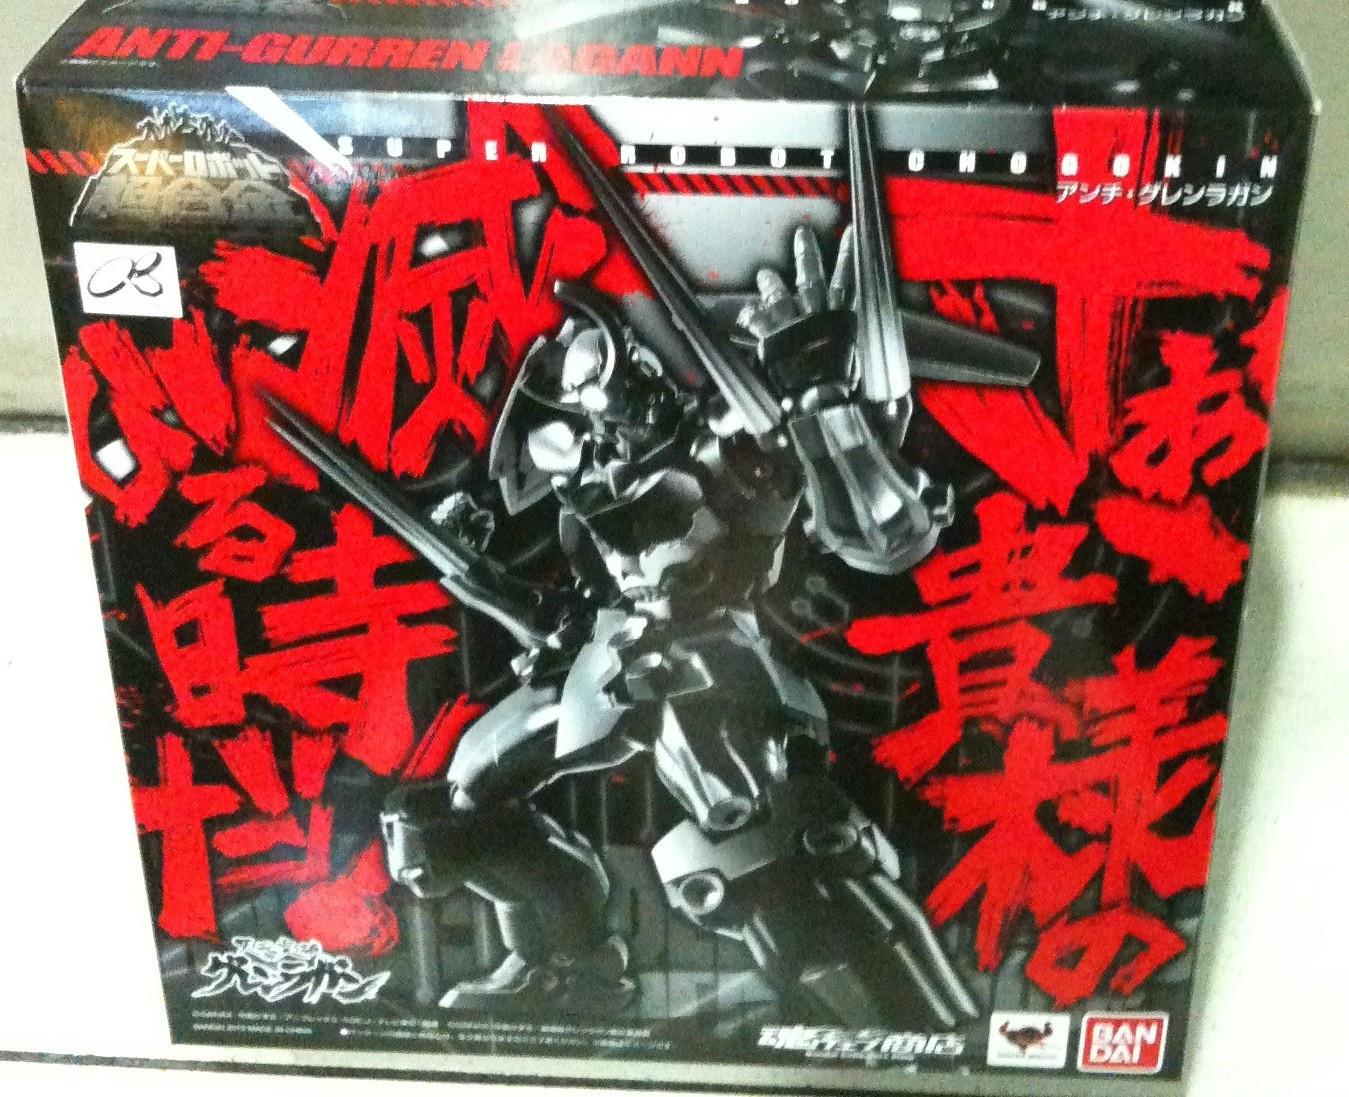 Super Robot Chogokin Anti-Gurren Lagann Tamashii Exclusive